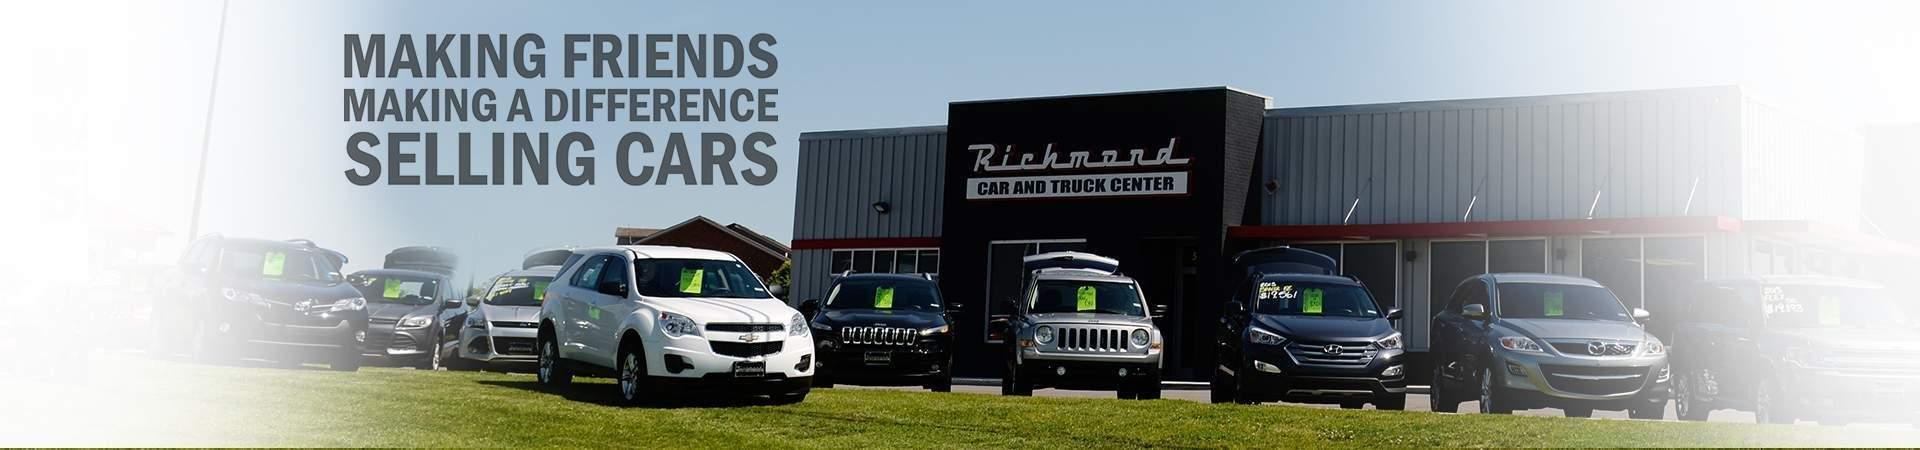 used car dealership in richmond kentucky